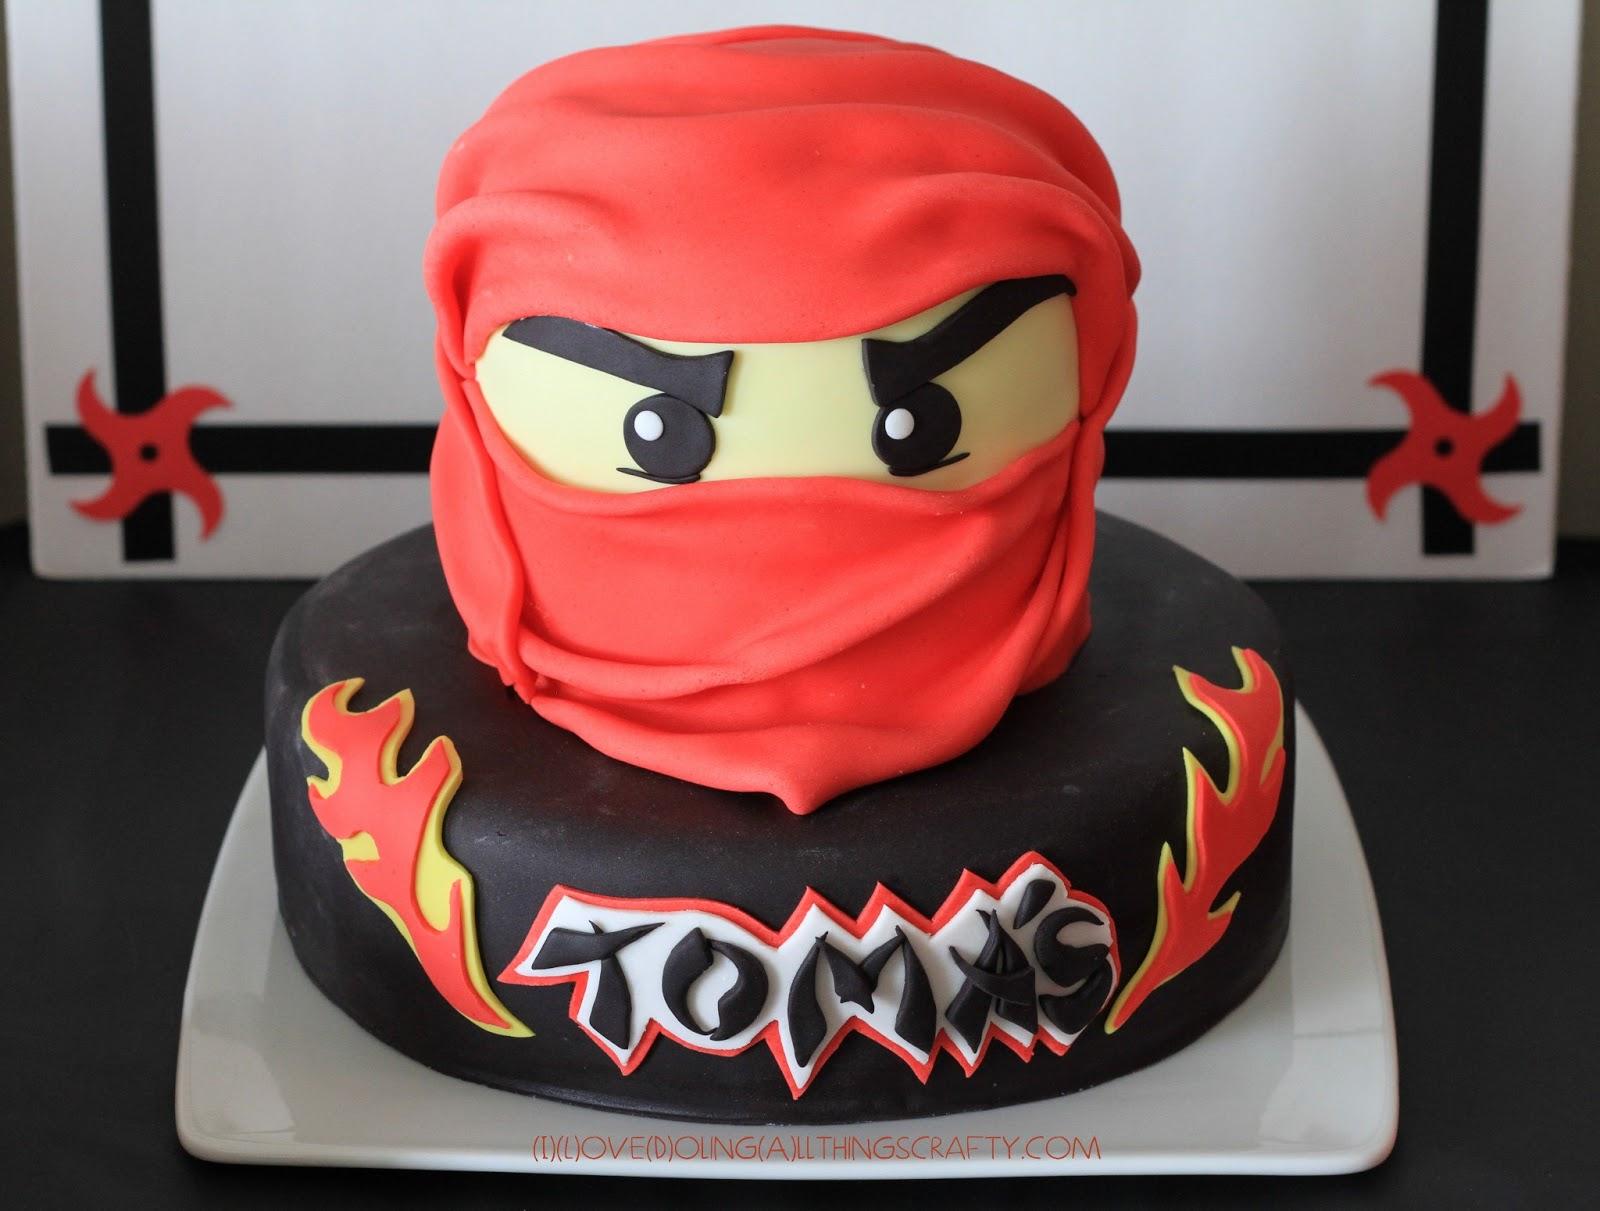 Remarkable I Love Doing All Things Crafty Ninjago Birthday Cake Funny Birthday Cards Online Inifofree Goldxyz